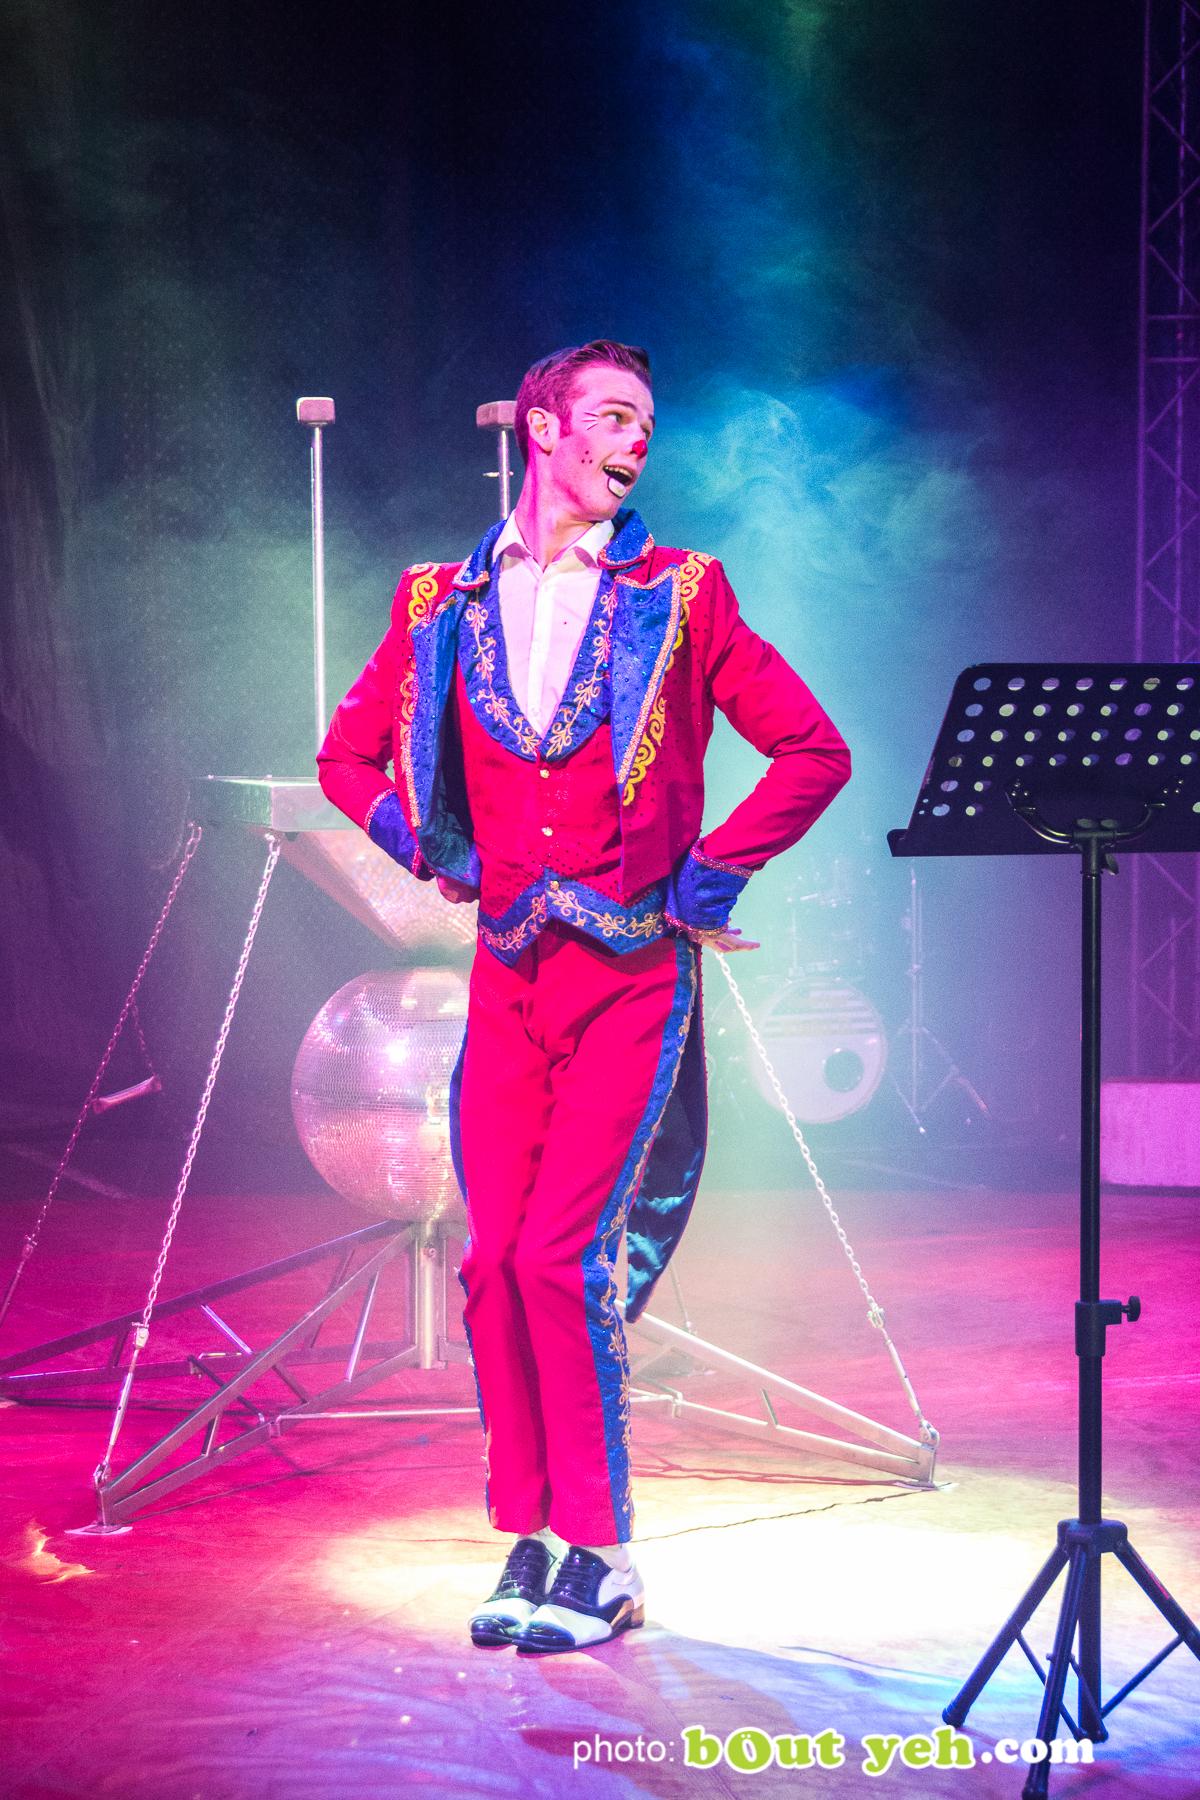 Bout Yeh photographers Belfast photograph 7558 - Circus Vegas